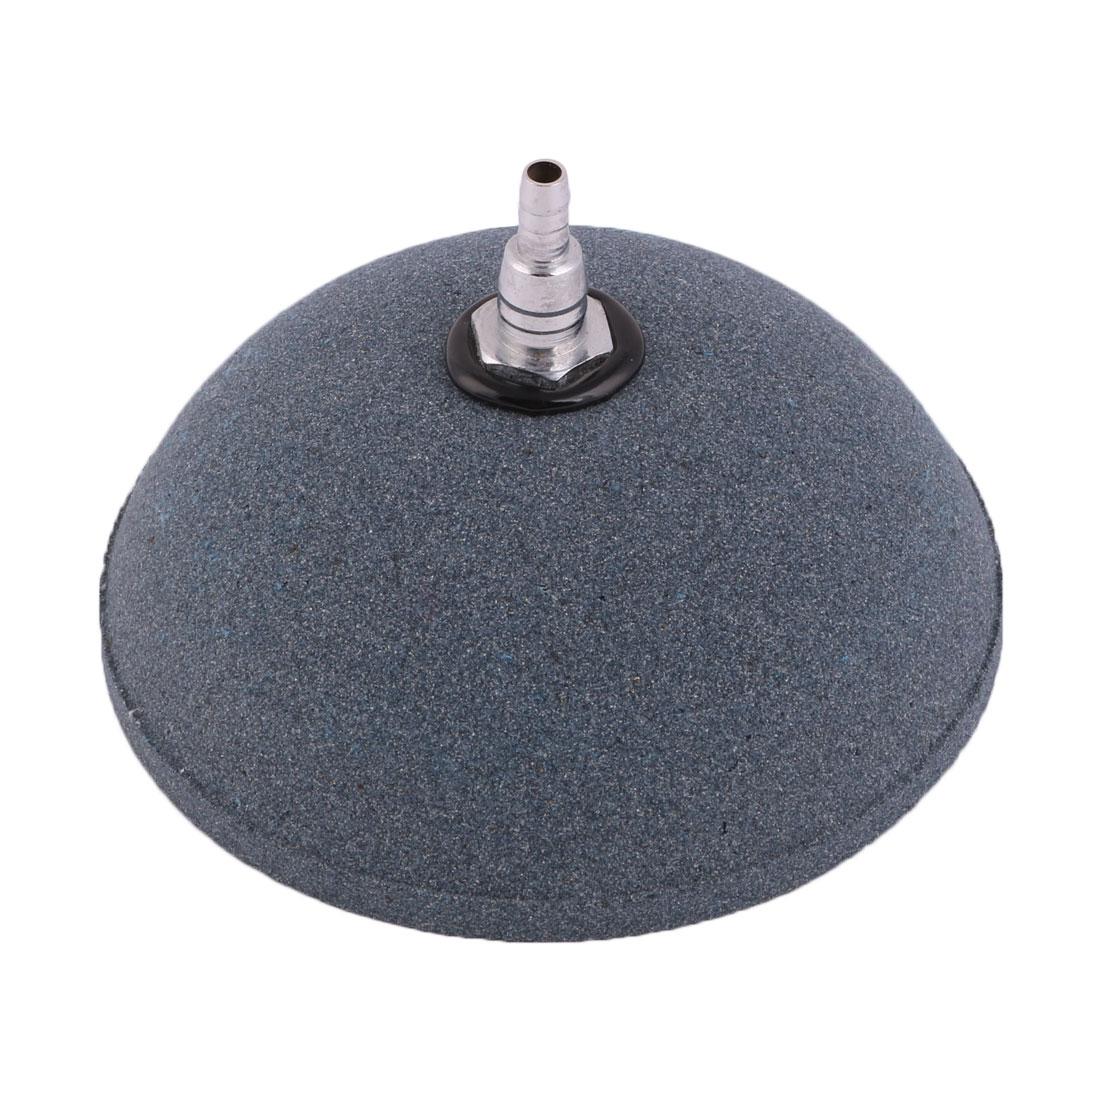 Aquarium Fish Tank Mineral Bubbles Oxygen Diffuser Air Stone 10cm Diameter Dark Gray